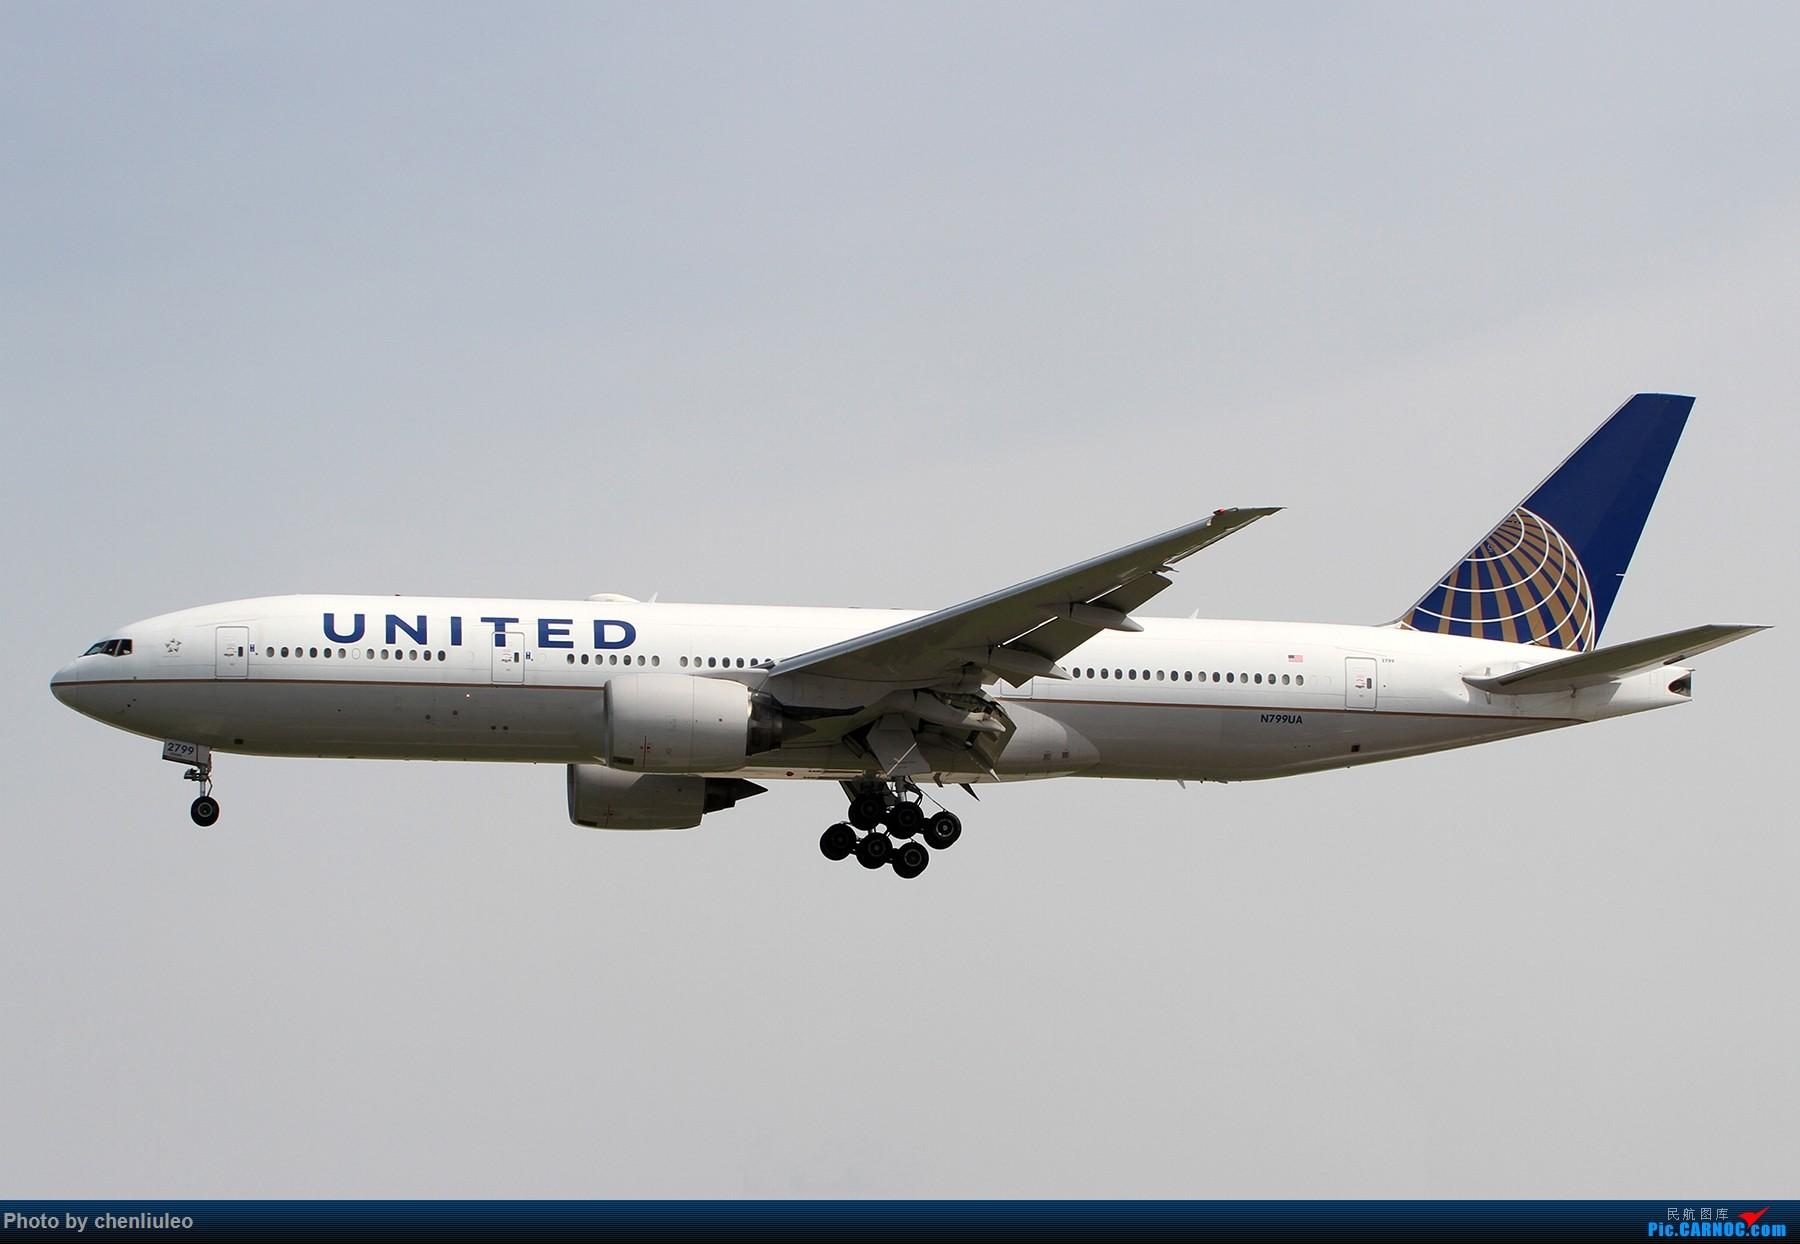 Re:[原创]【北美飞友会】芝加哥奥黑尔机场首拍 BOEING 777-200ER N799UA 美国芝加哥奥黑尔国际机场